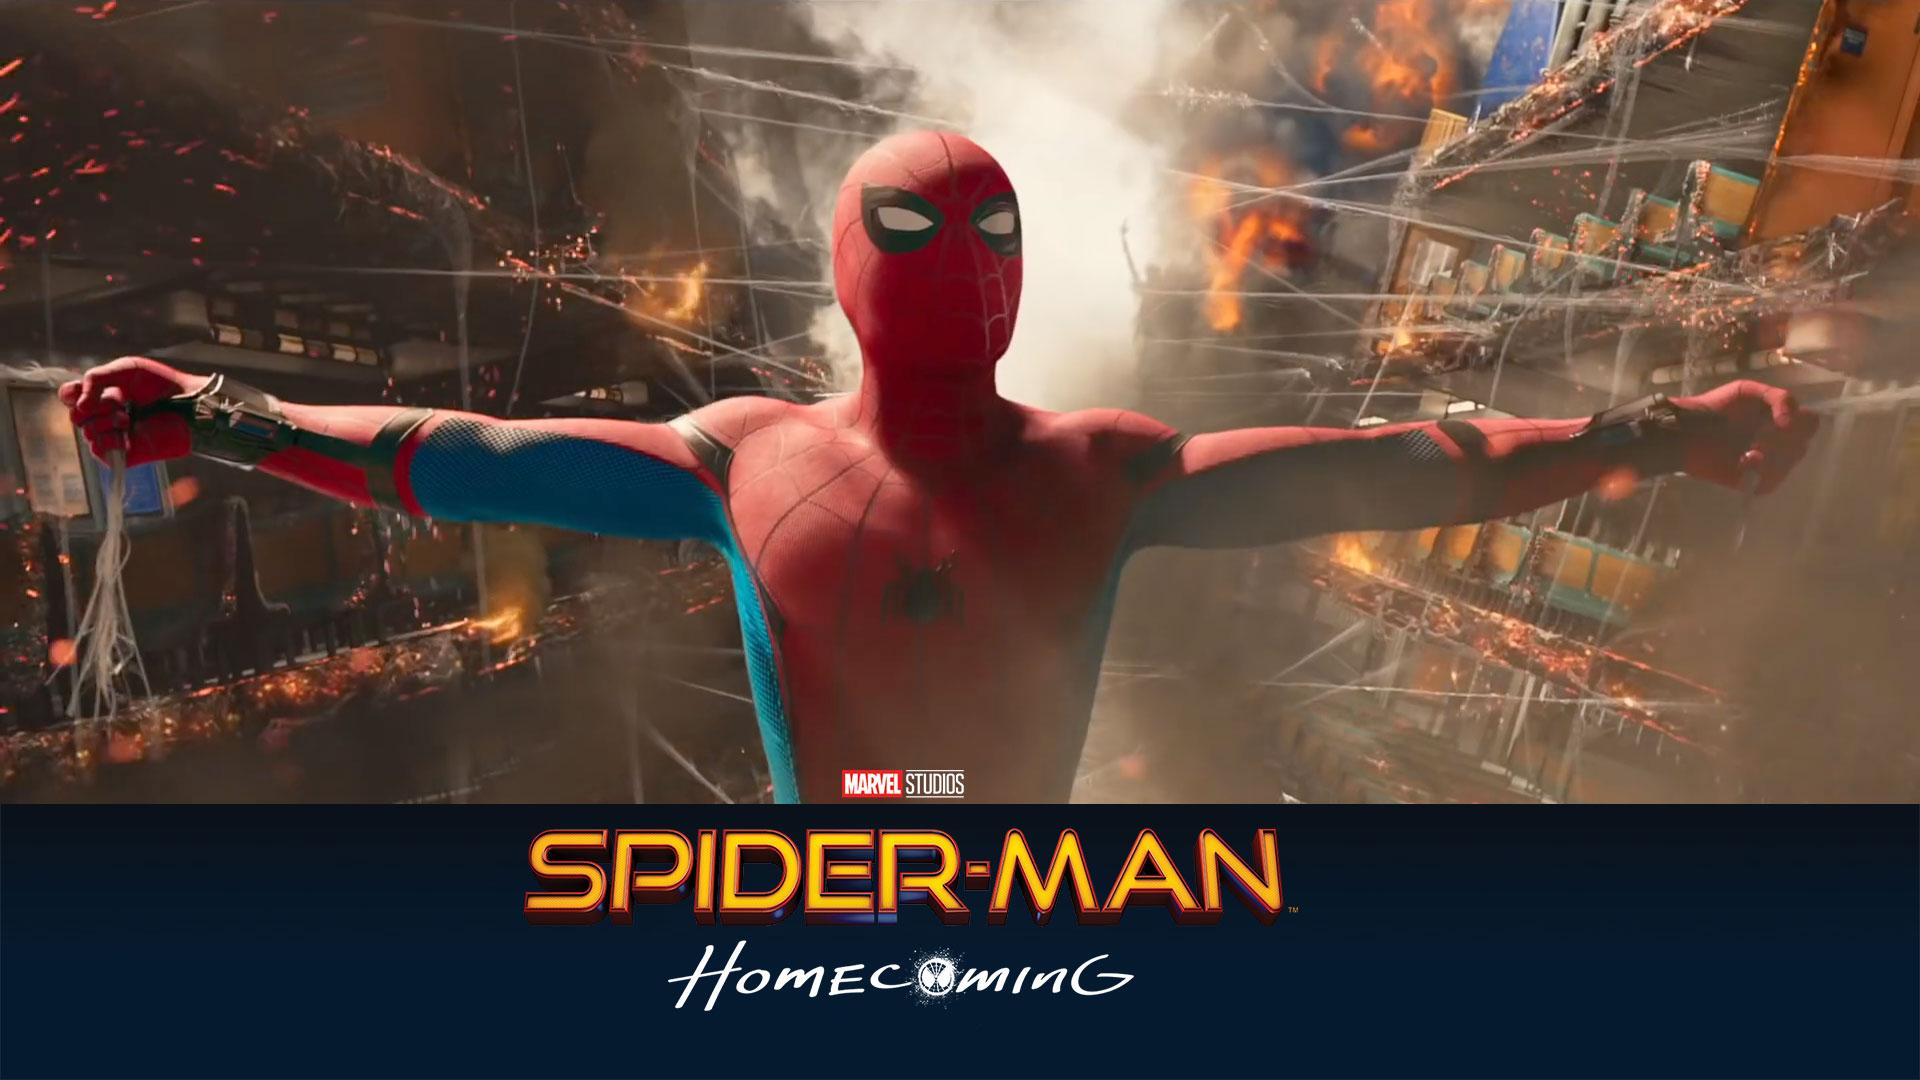 Spider-Man: Homecoming (2017) - USA